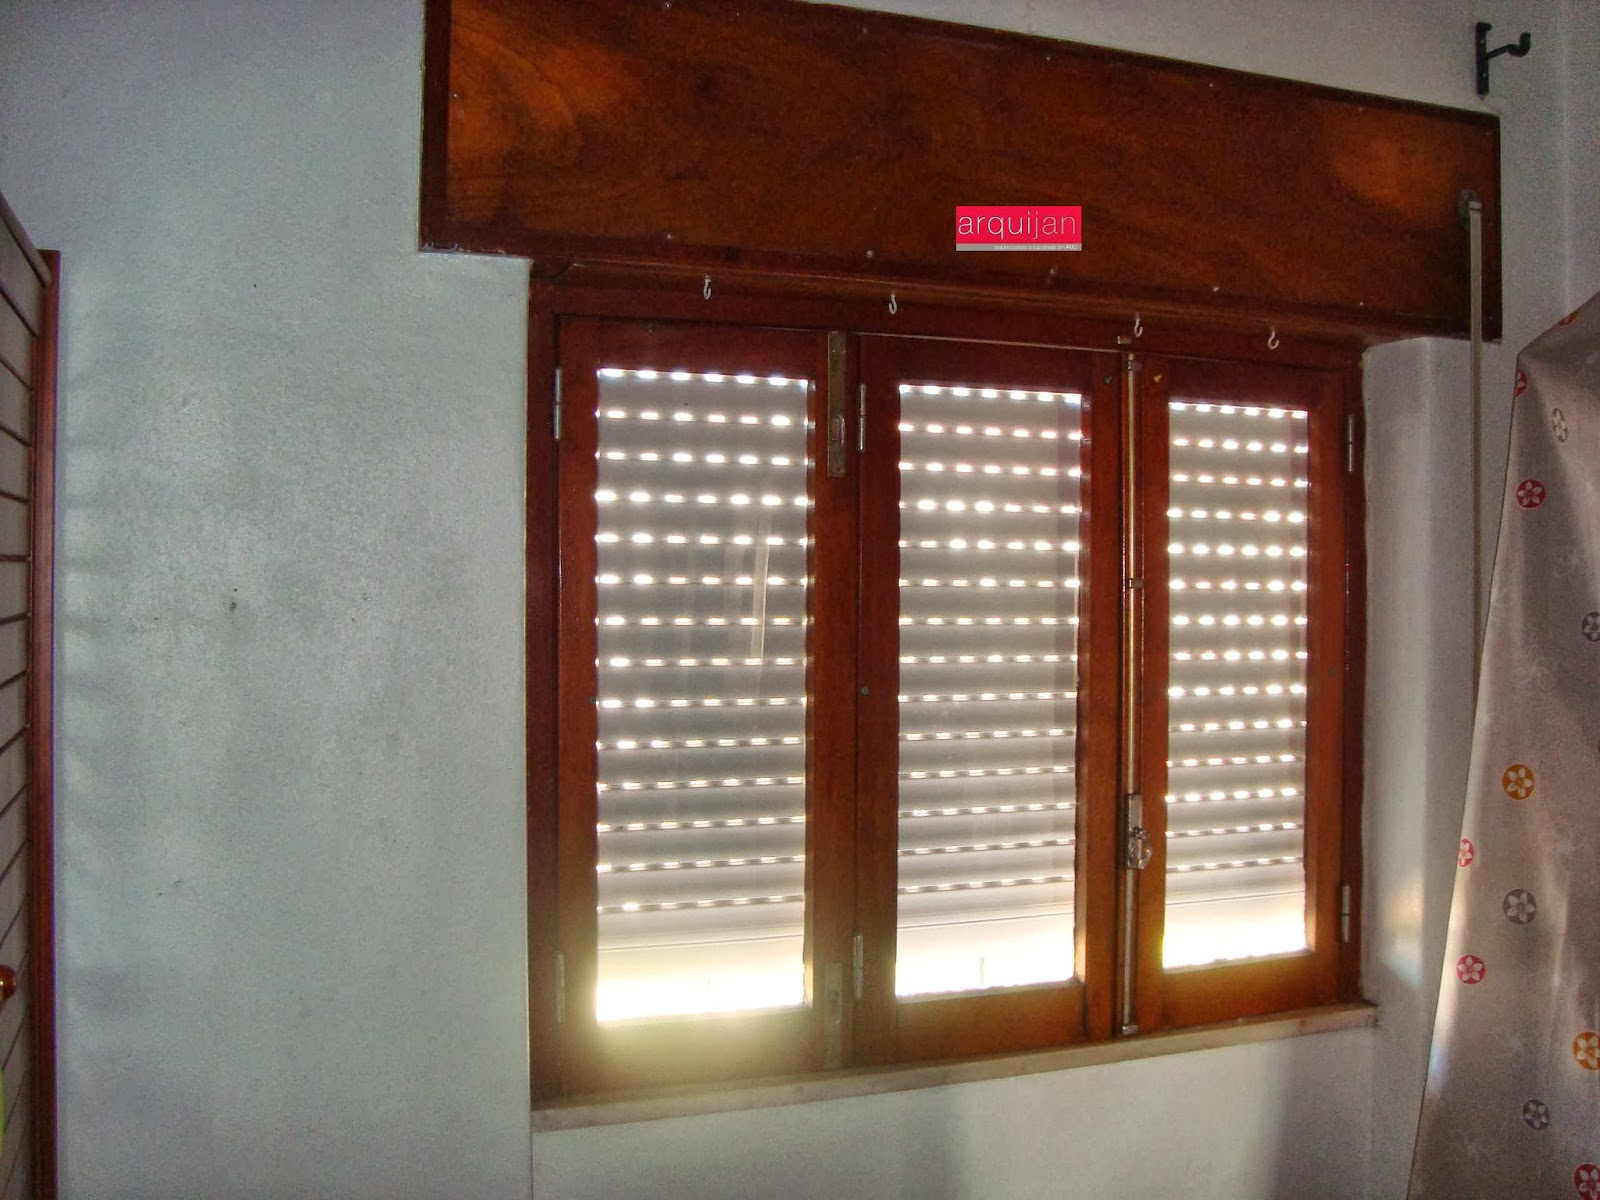 #B51636  Janelas Alumínio Portas Alumínio Marquises: Trocar janelas de 1672 Janela De Aluminio Manutenção